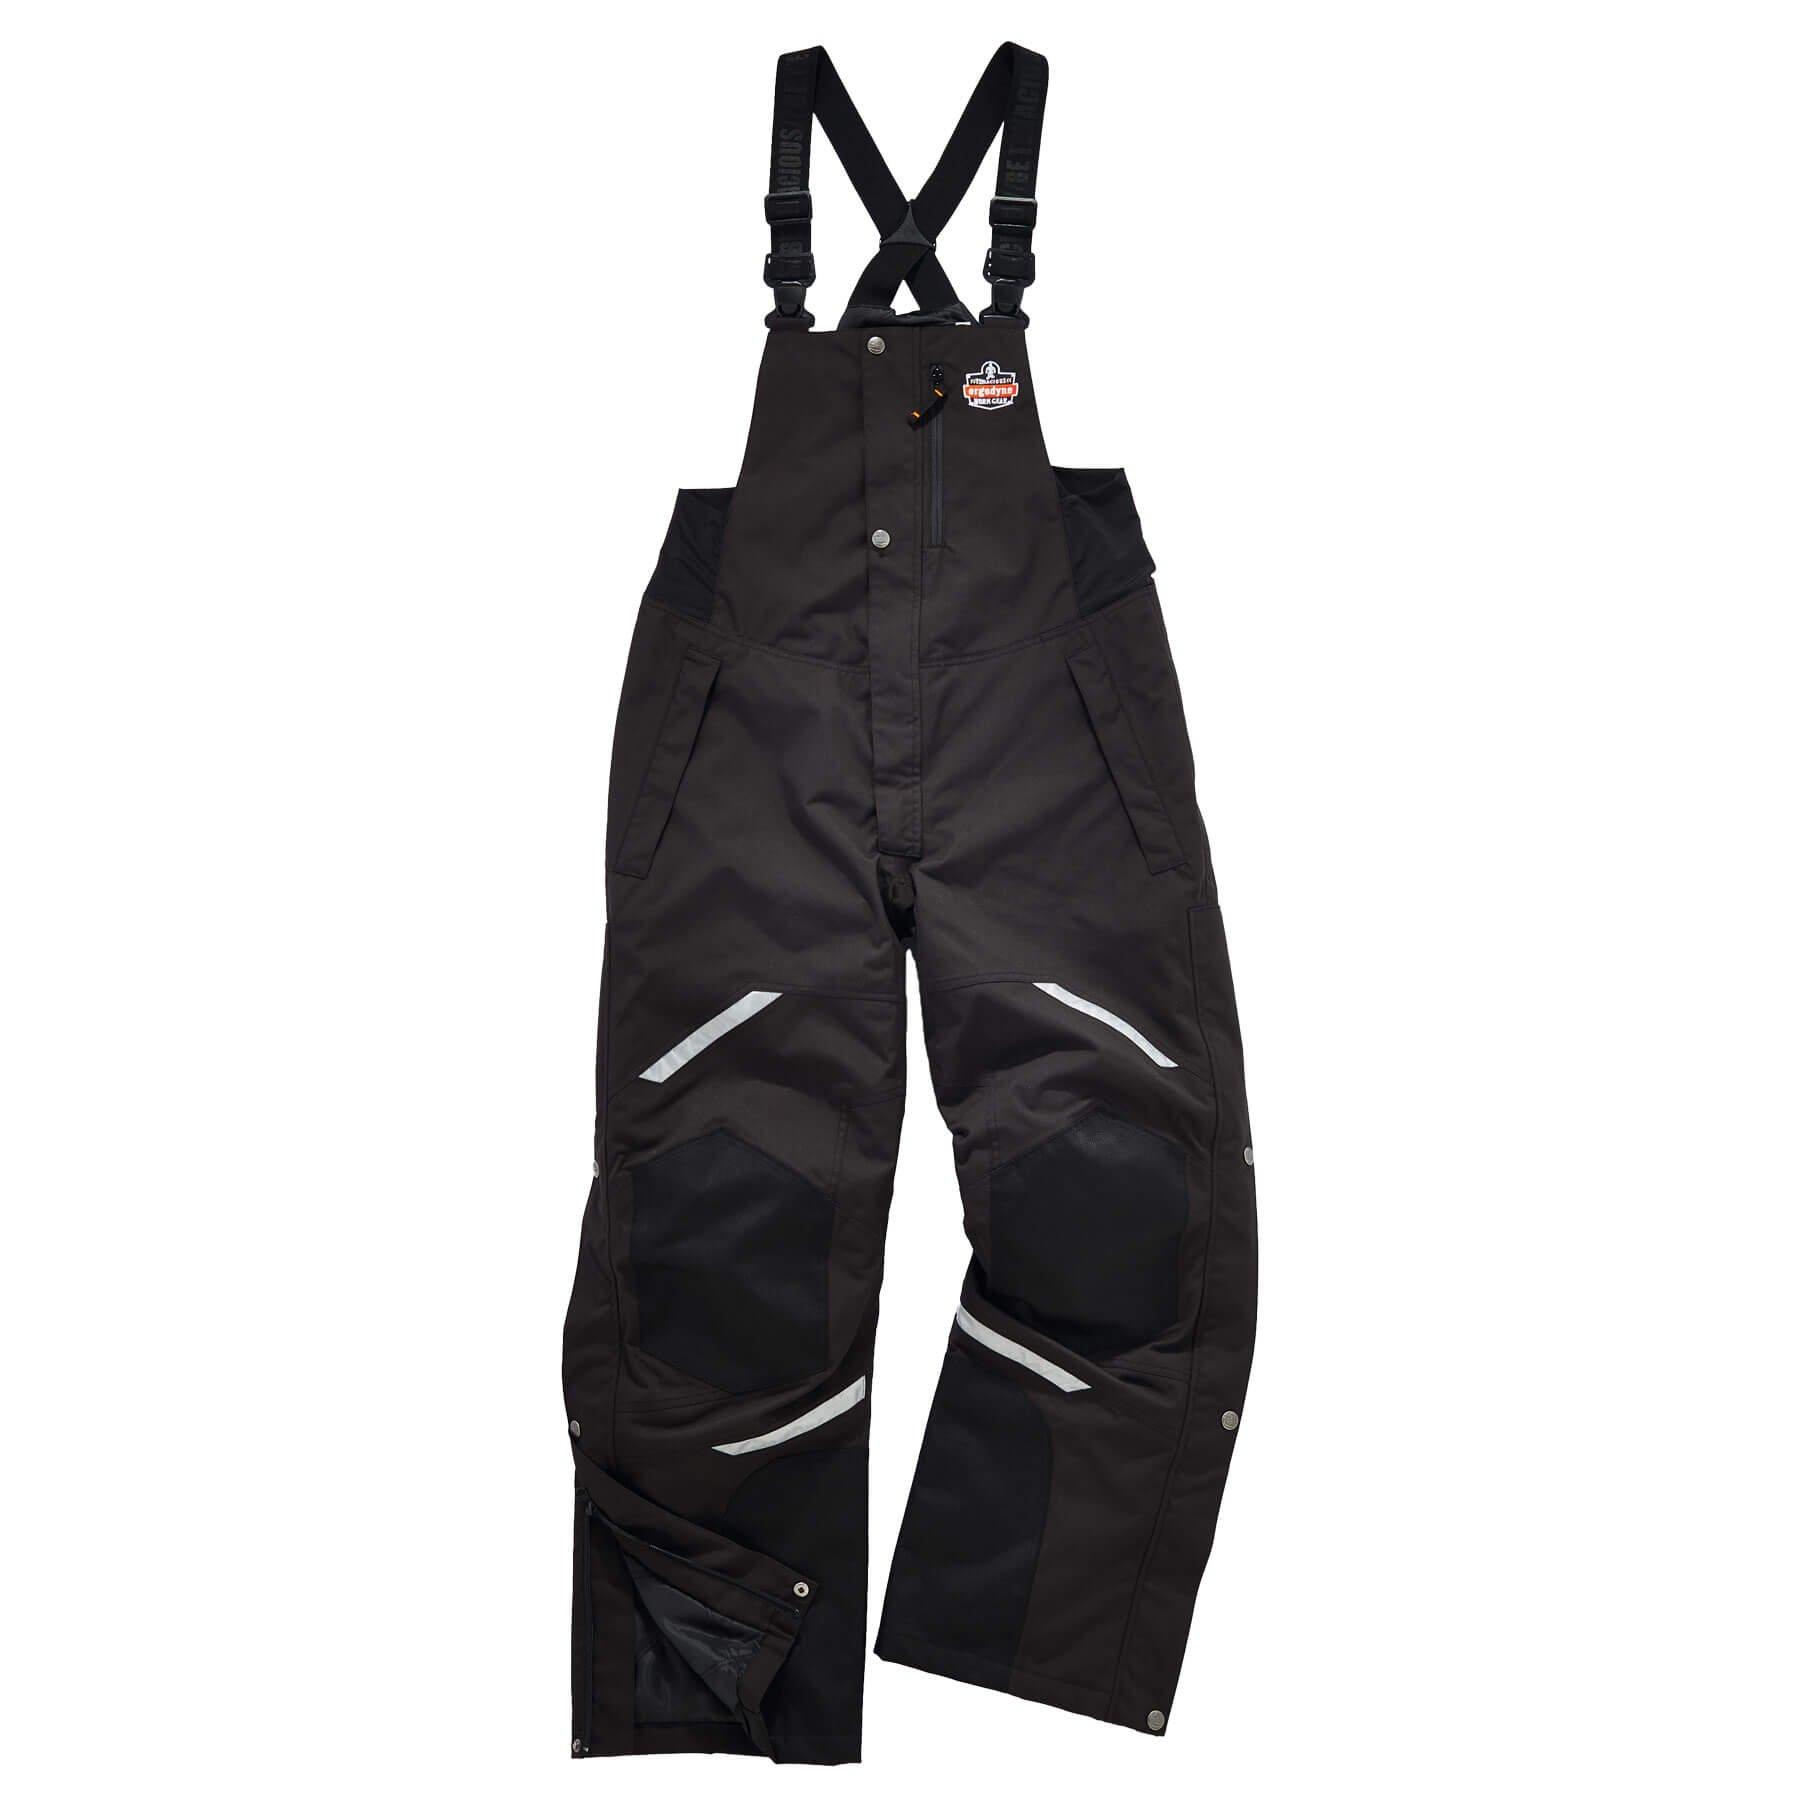 Ergodyne N-Ferno 6471 Men's Winter Thermal Work Bib Overalls, Black, Large by Ergodyne (Image #2)